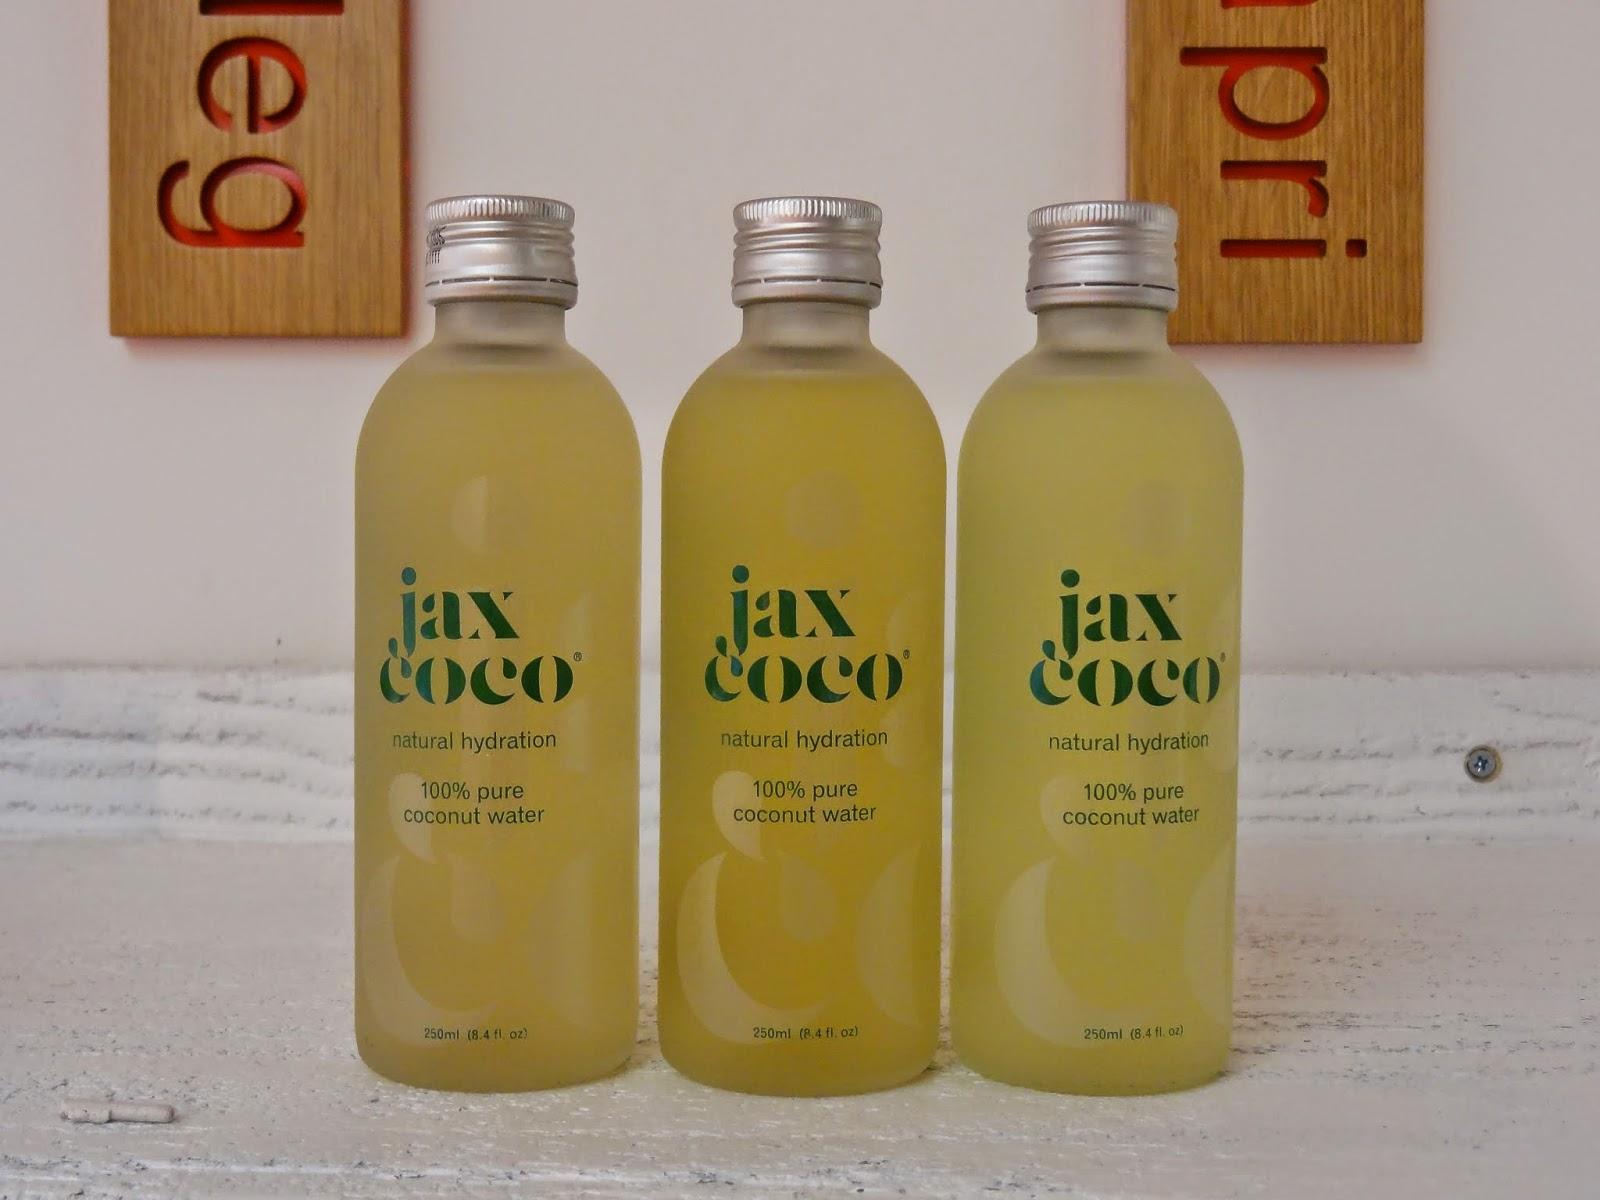 Sweaty Betty GF4F 30 Day Sweat Challenge Launch Jax Coco Coconut Water